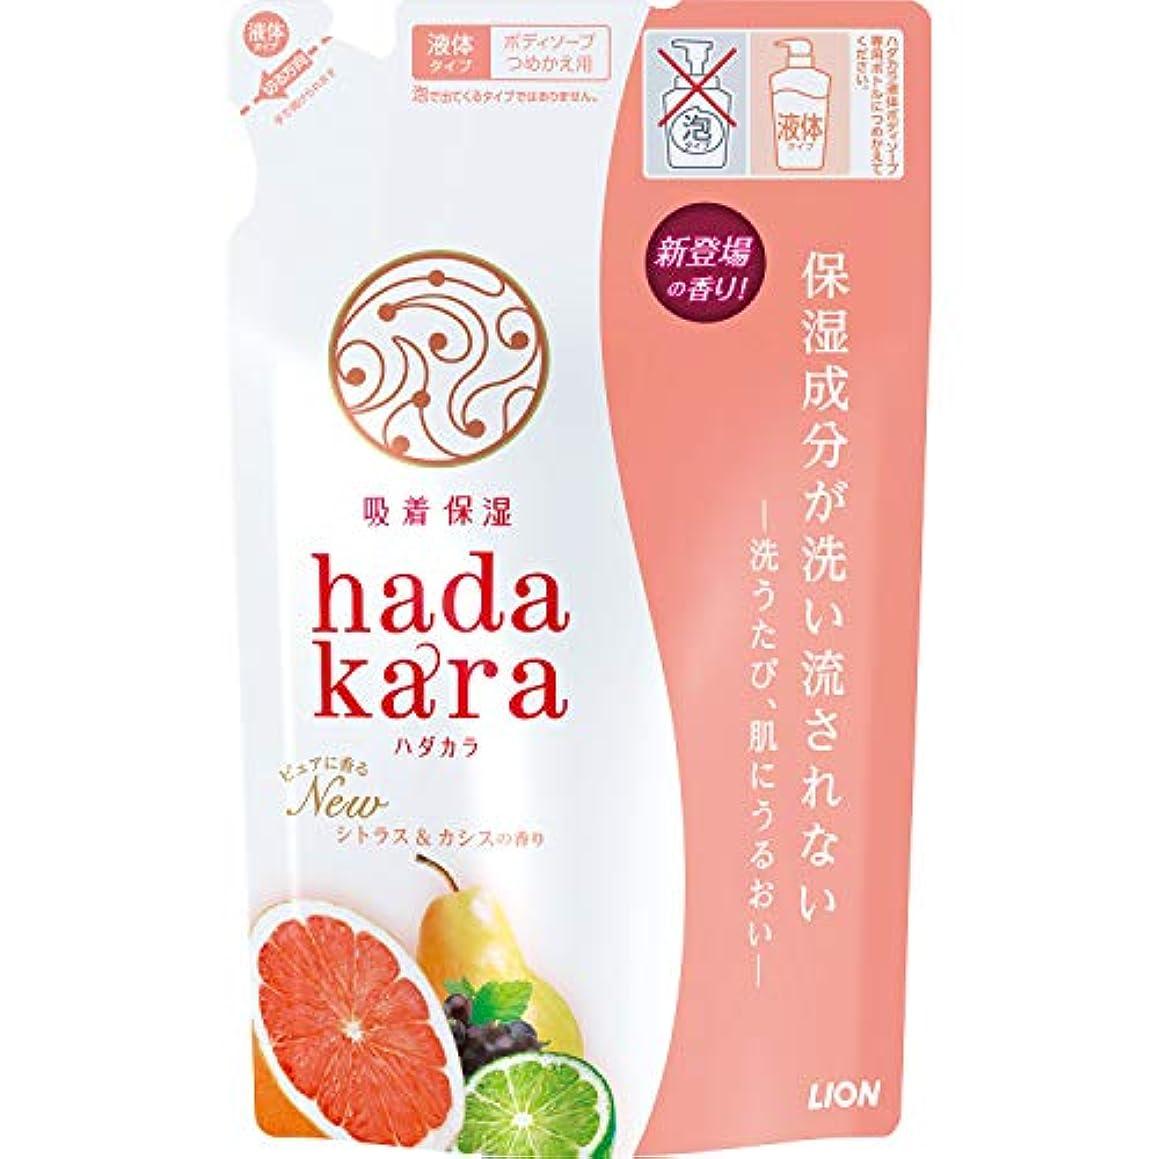 hadakara(ハダカラ)ボディソープ シトラス&カシスの香り つめかえ 360ml